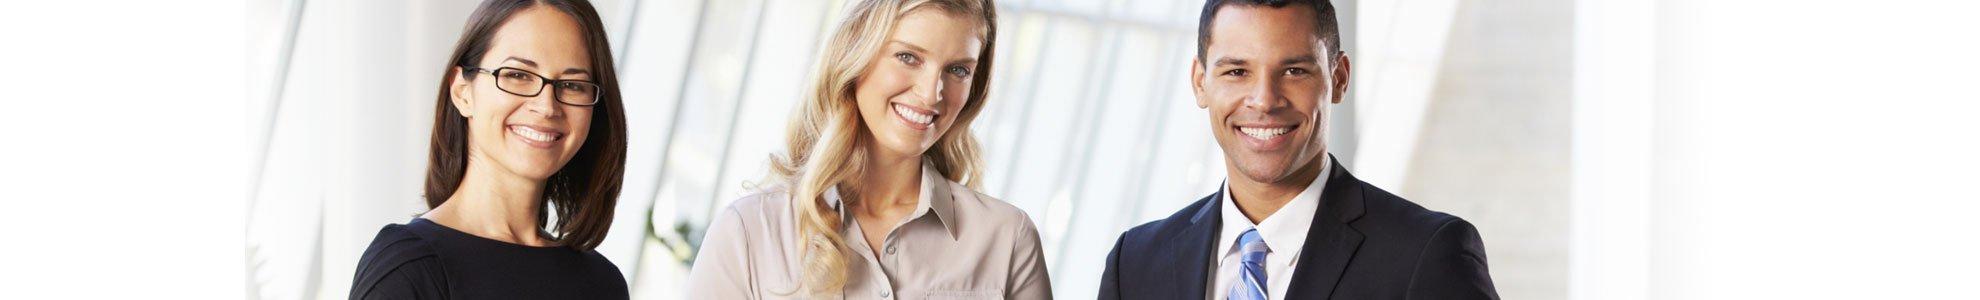 westralian-insurance-professional